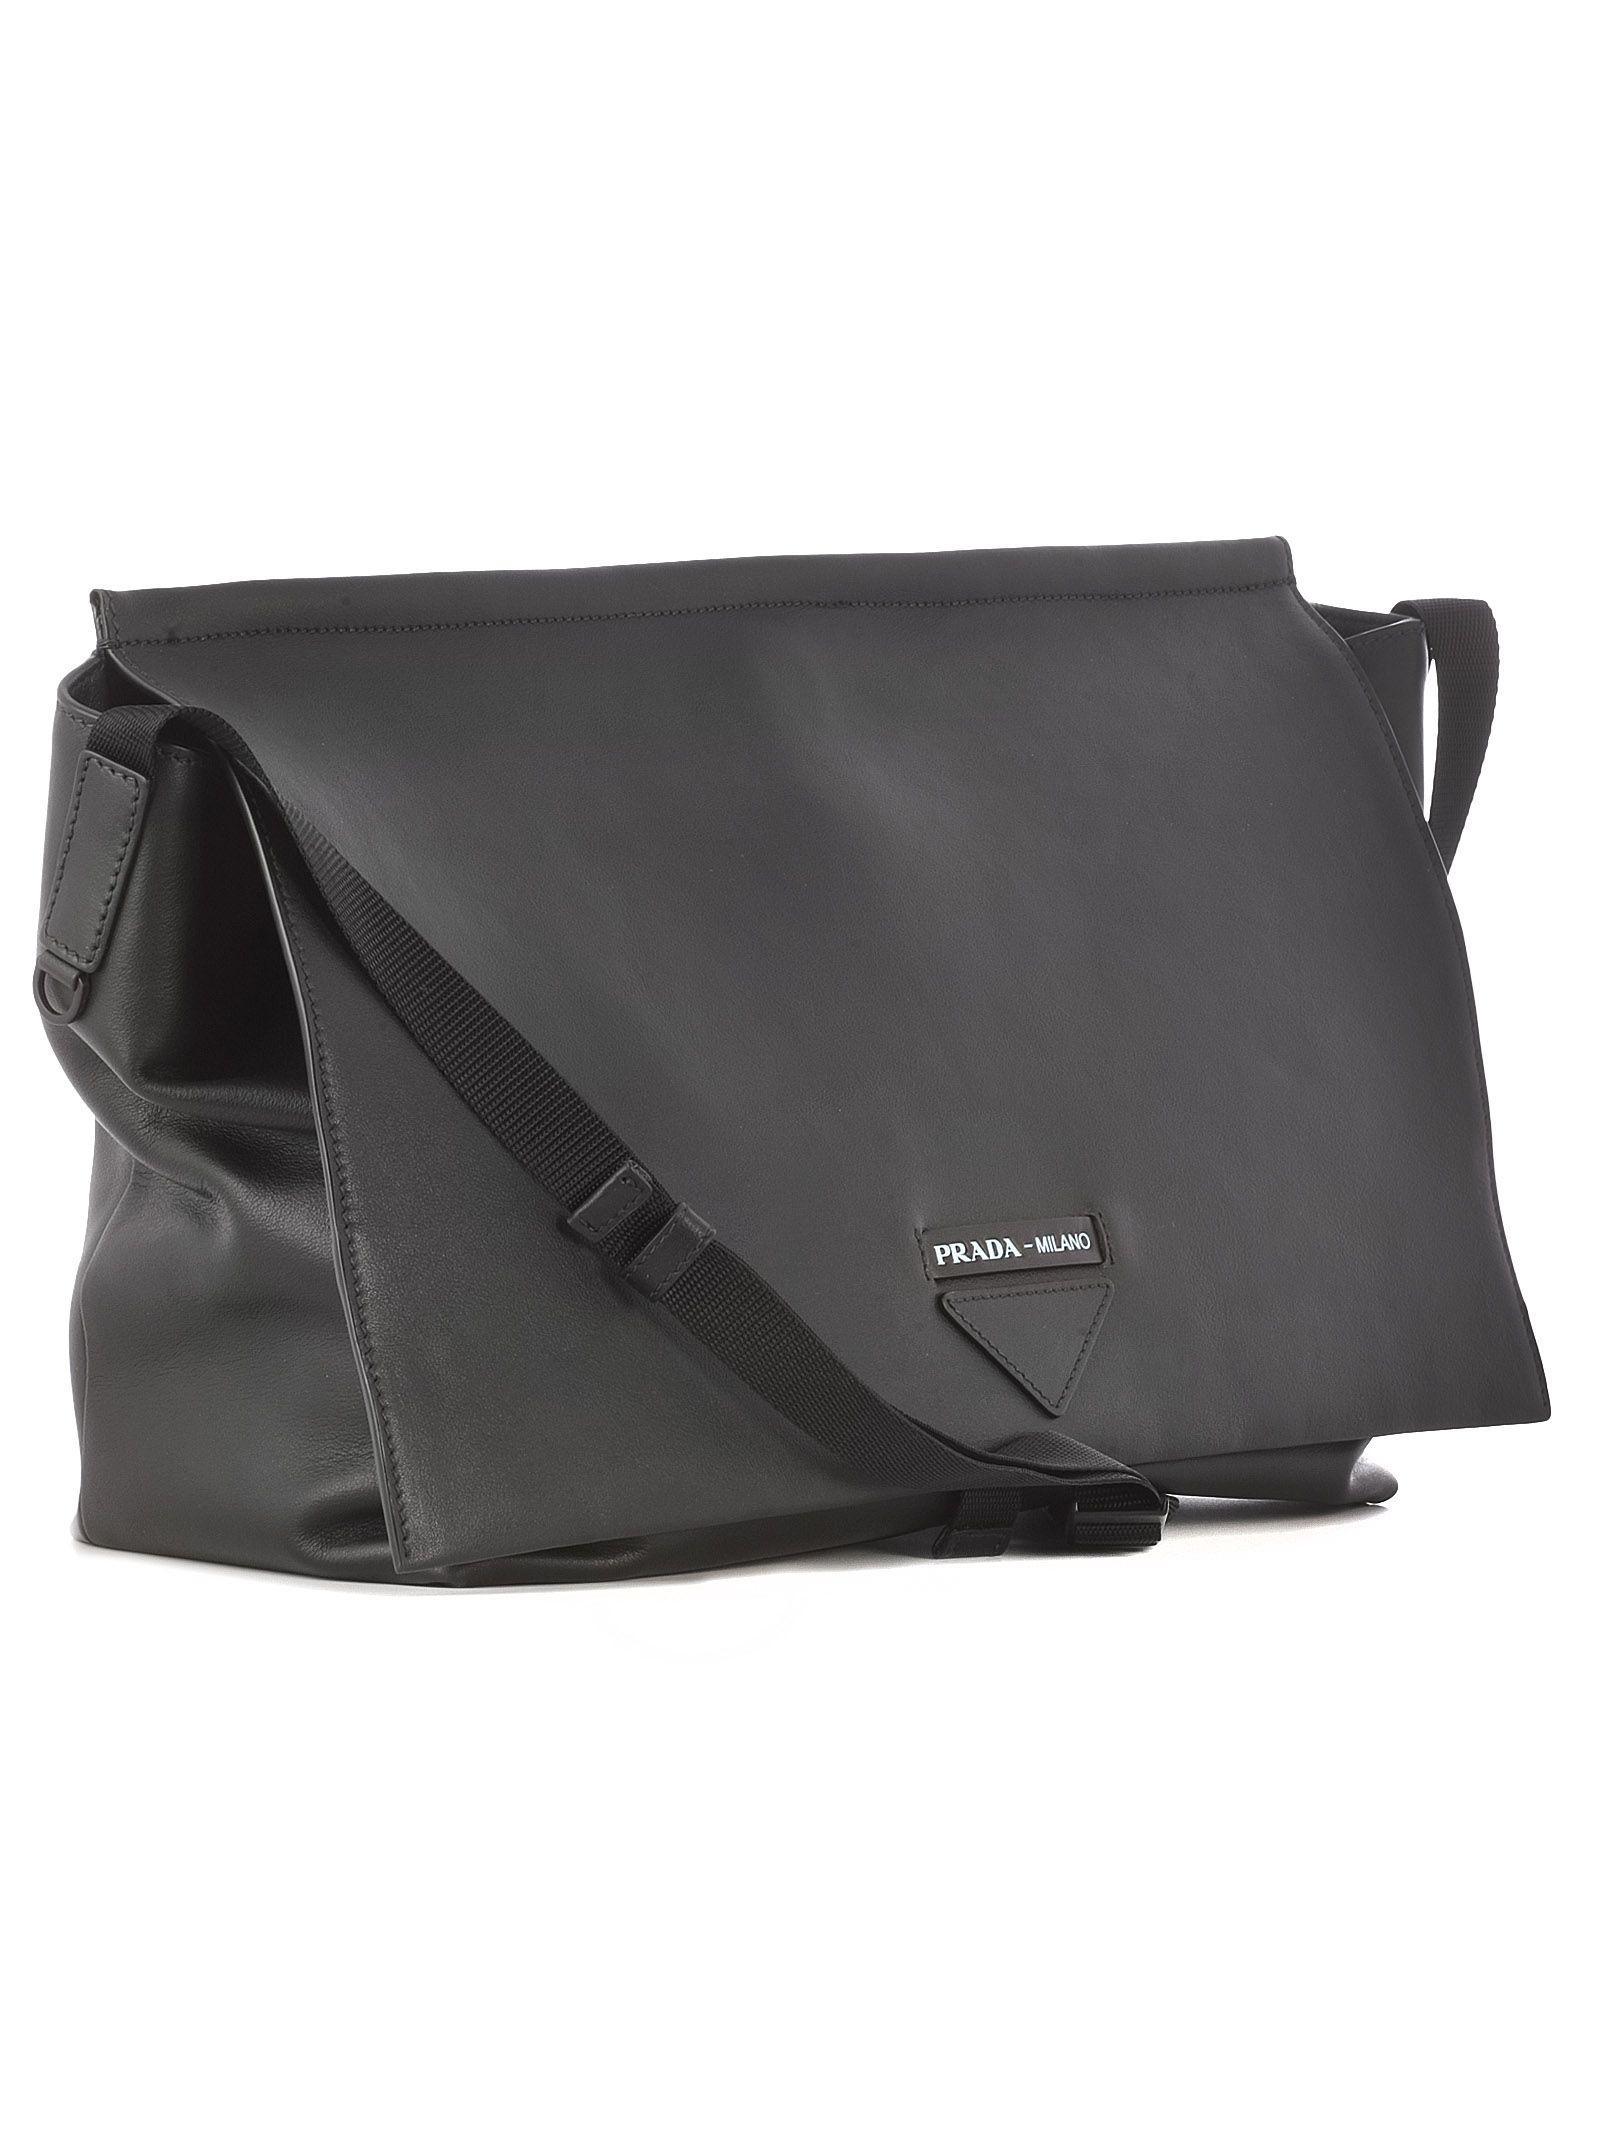 c12b05b2c57d Prada - Men s Black Leather Messenger Bag for Men - Lyst. View fullscreen